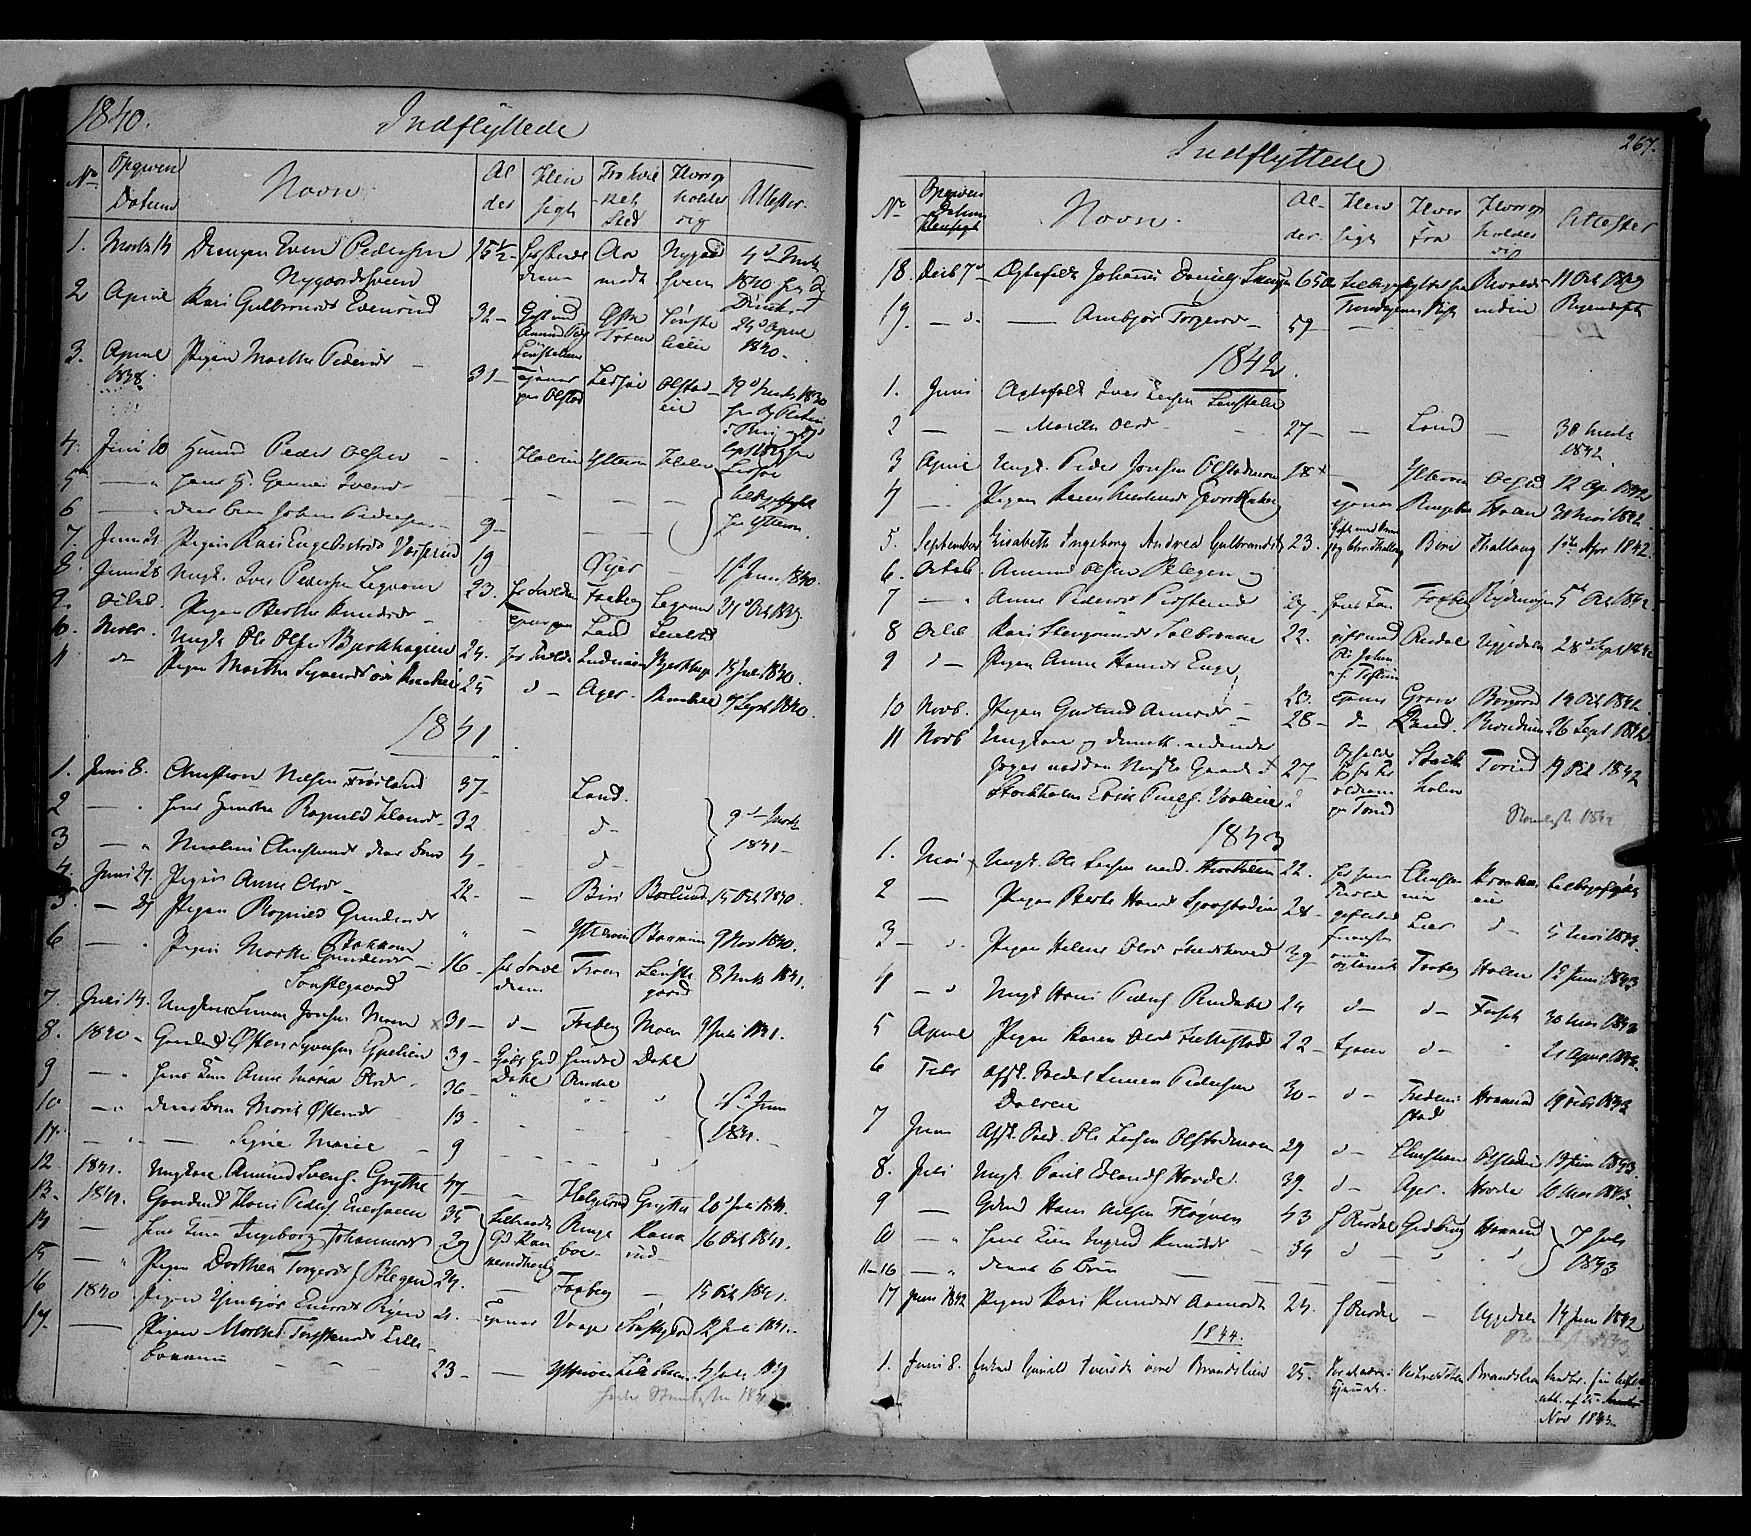 SAH, Gausdal prestekontor, Ministerialbok nr. 7, 1840-1850, s. 267